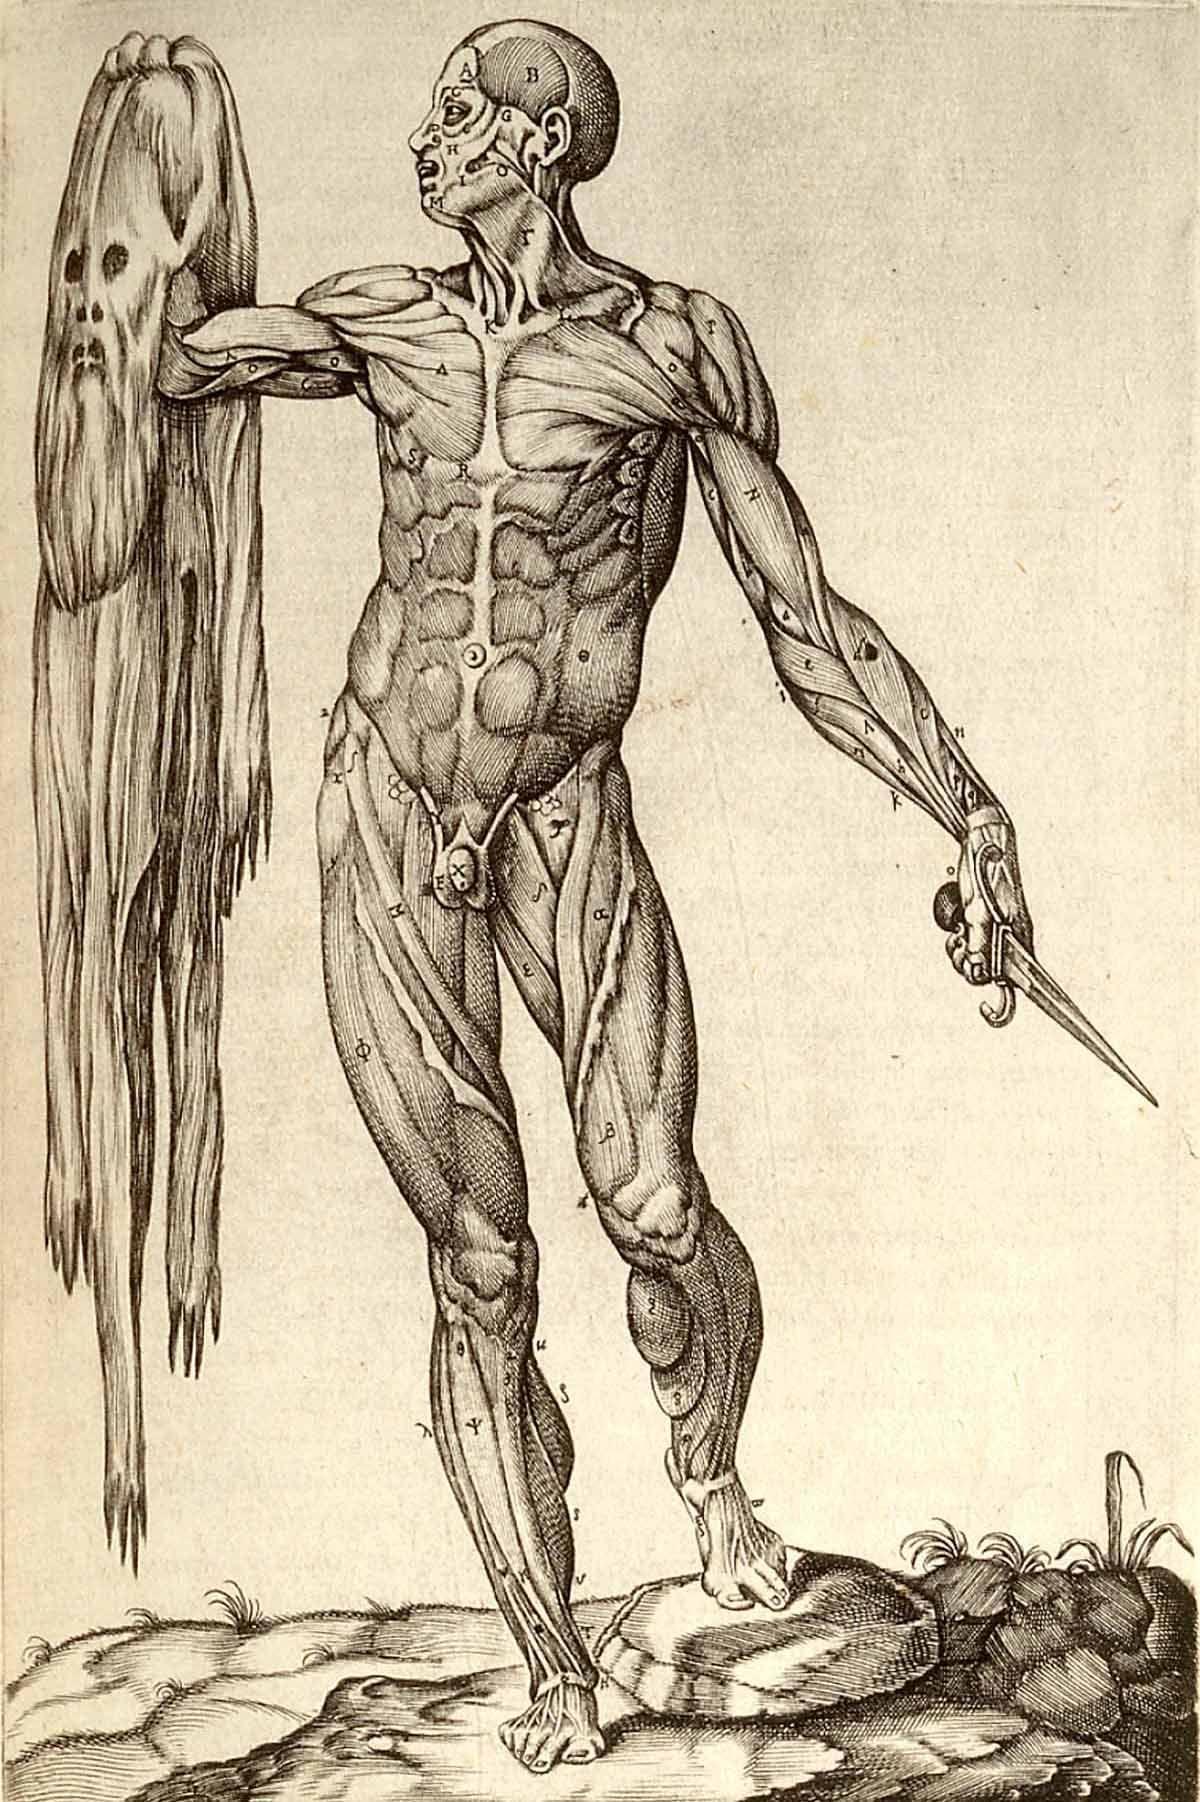 Pin by Oleg A on Anatomy | Pinterest | Anatomy